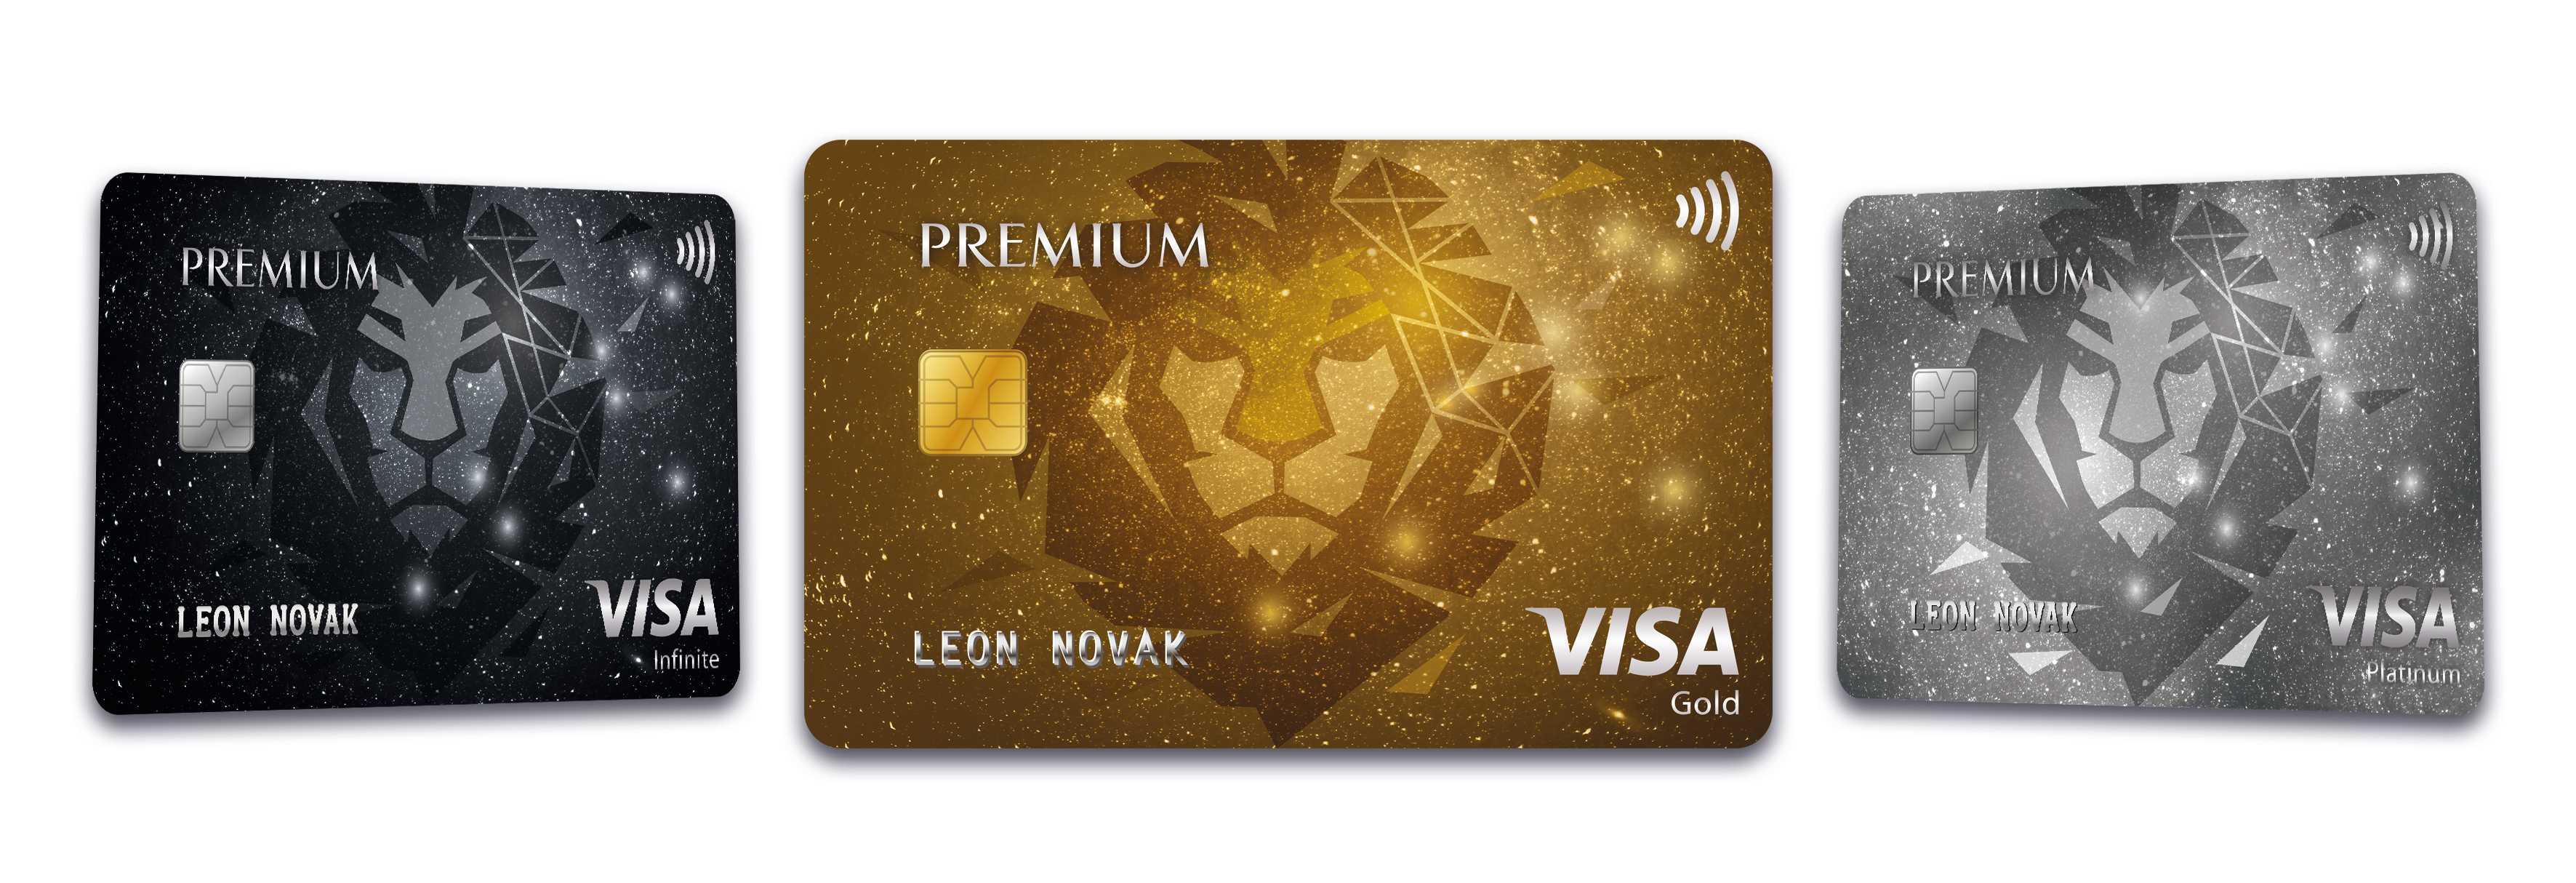 New Visa Premium Cards Launched